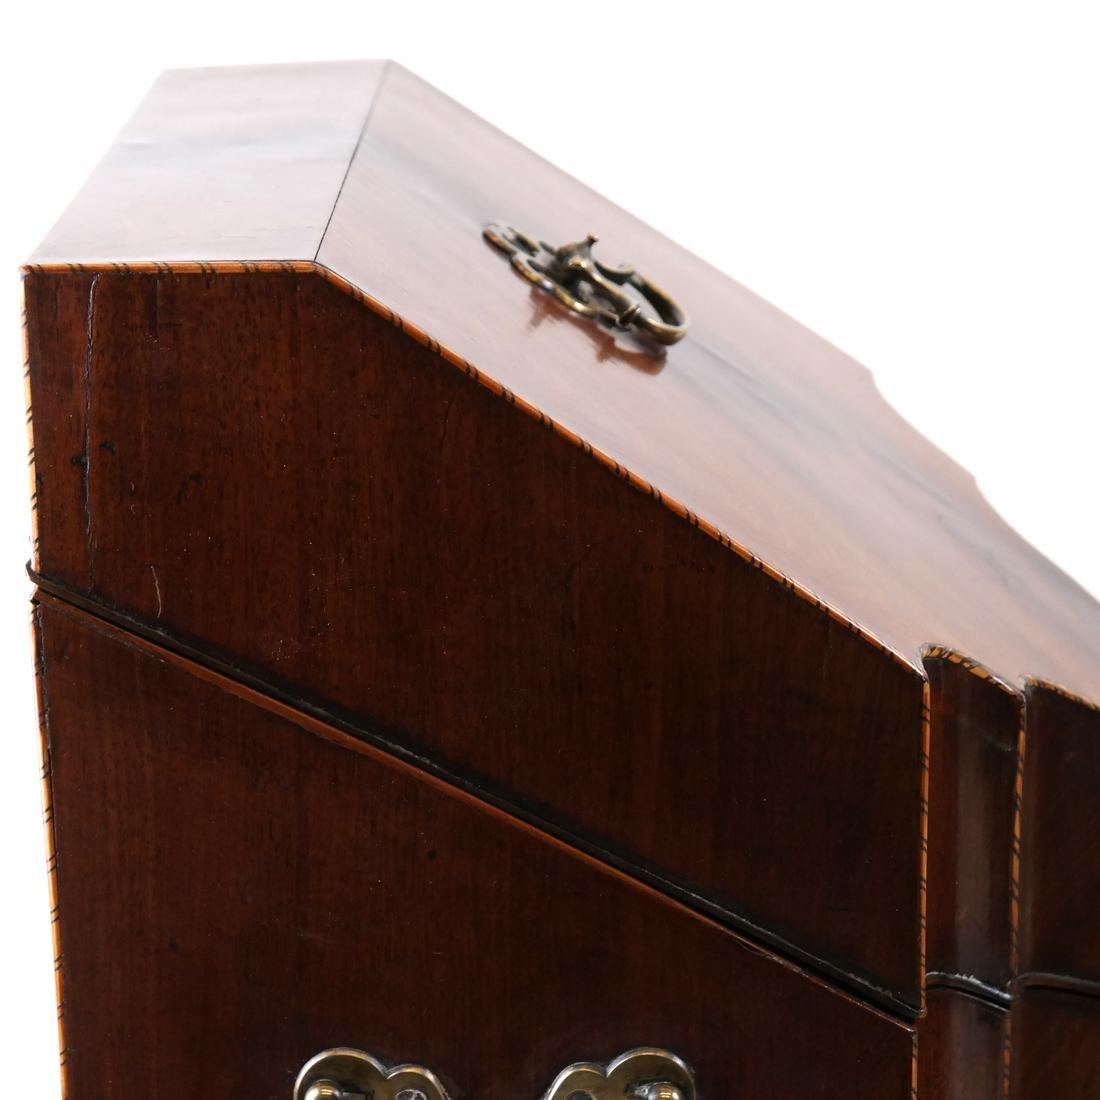 Pair of Georgian Knife Boxes - 4